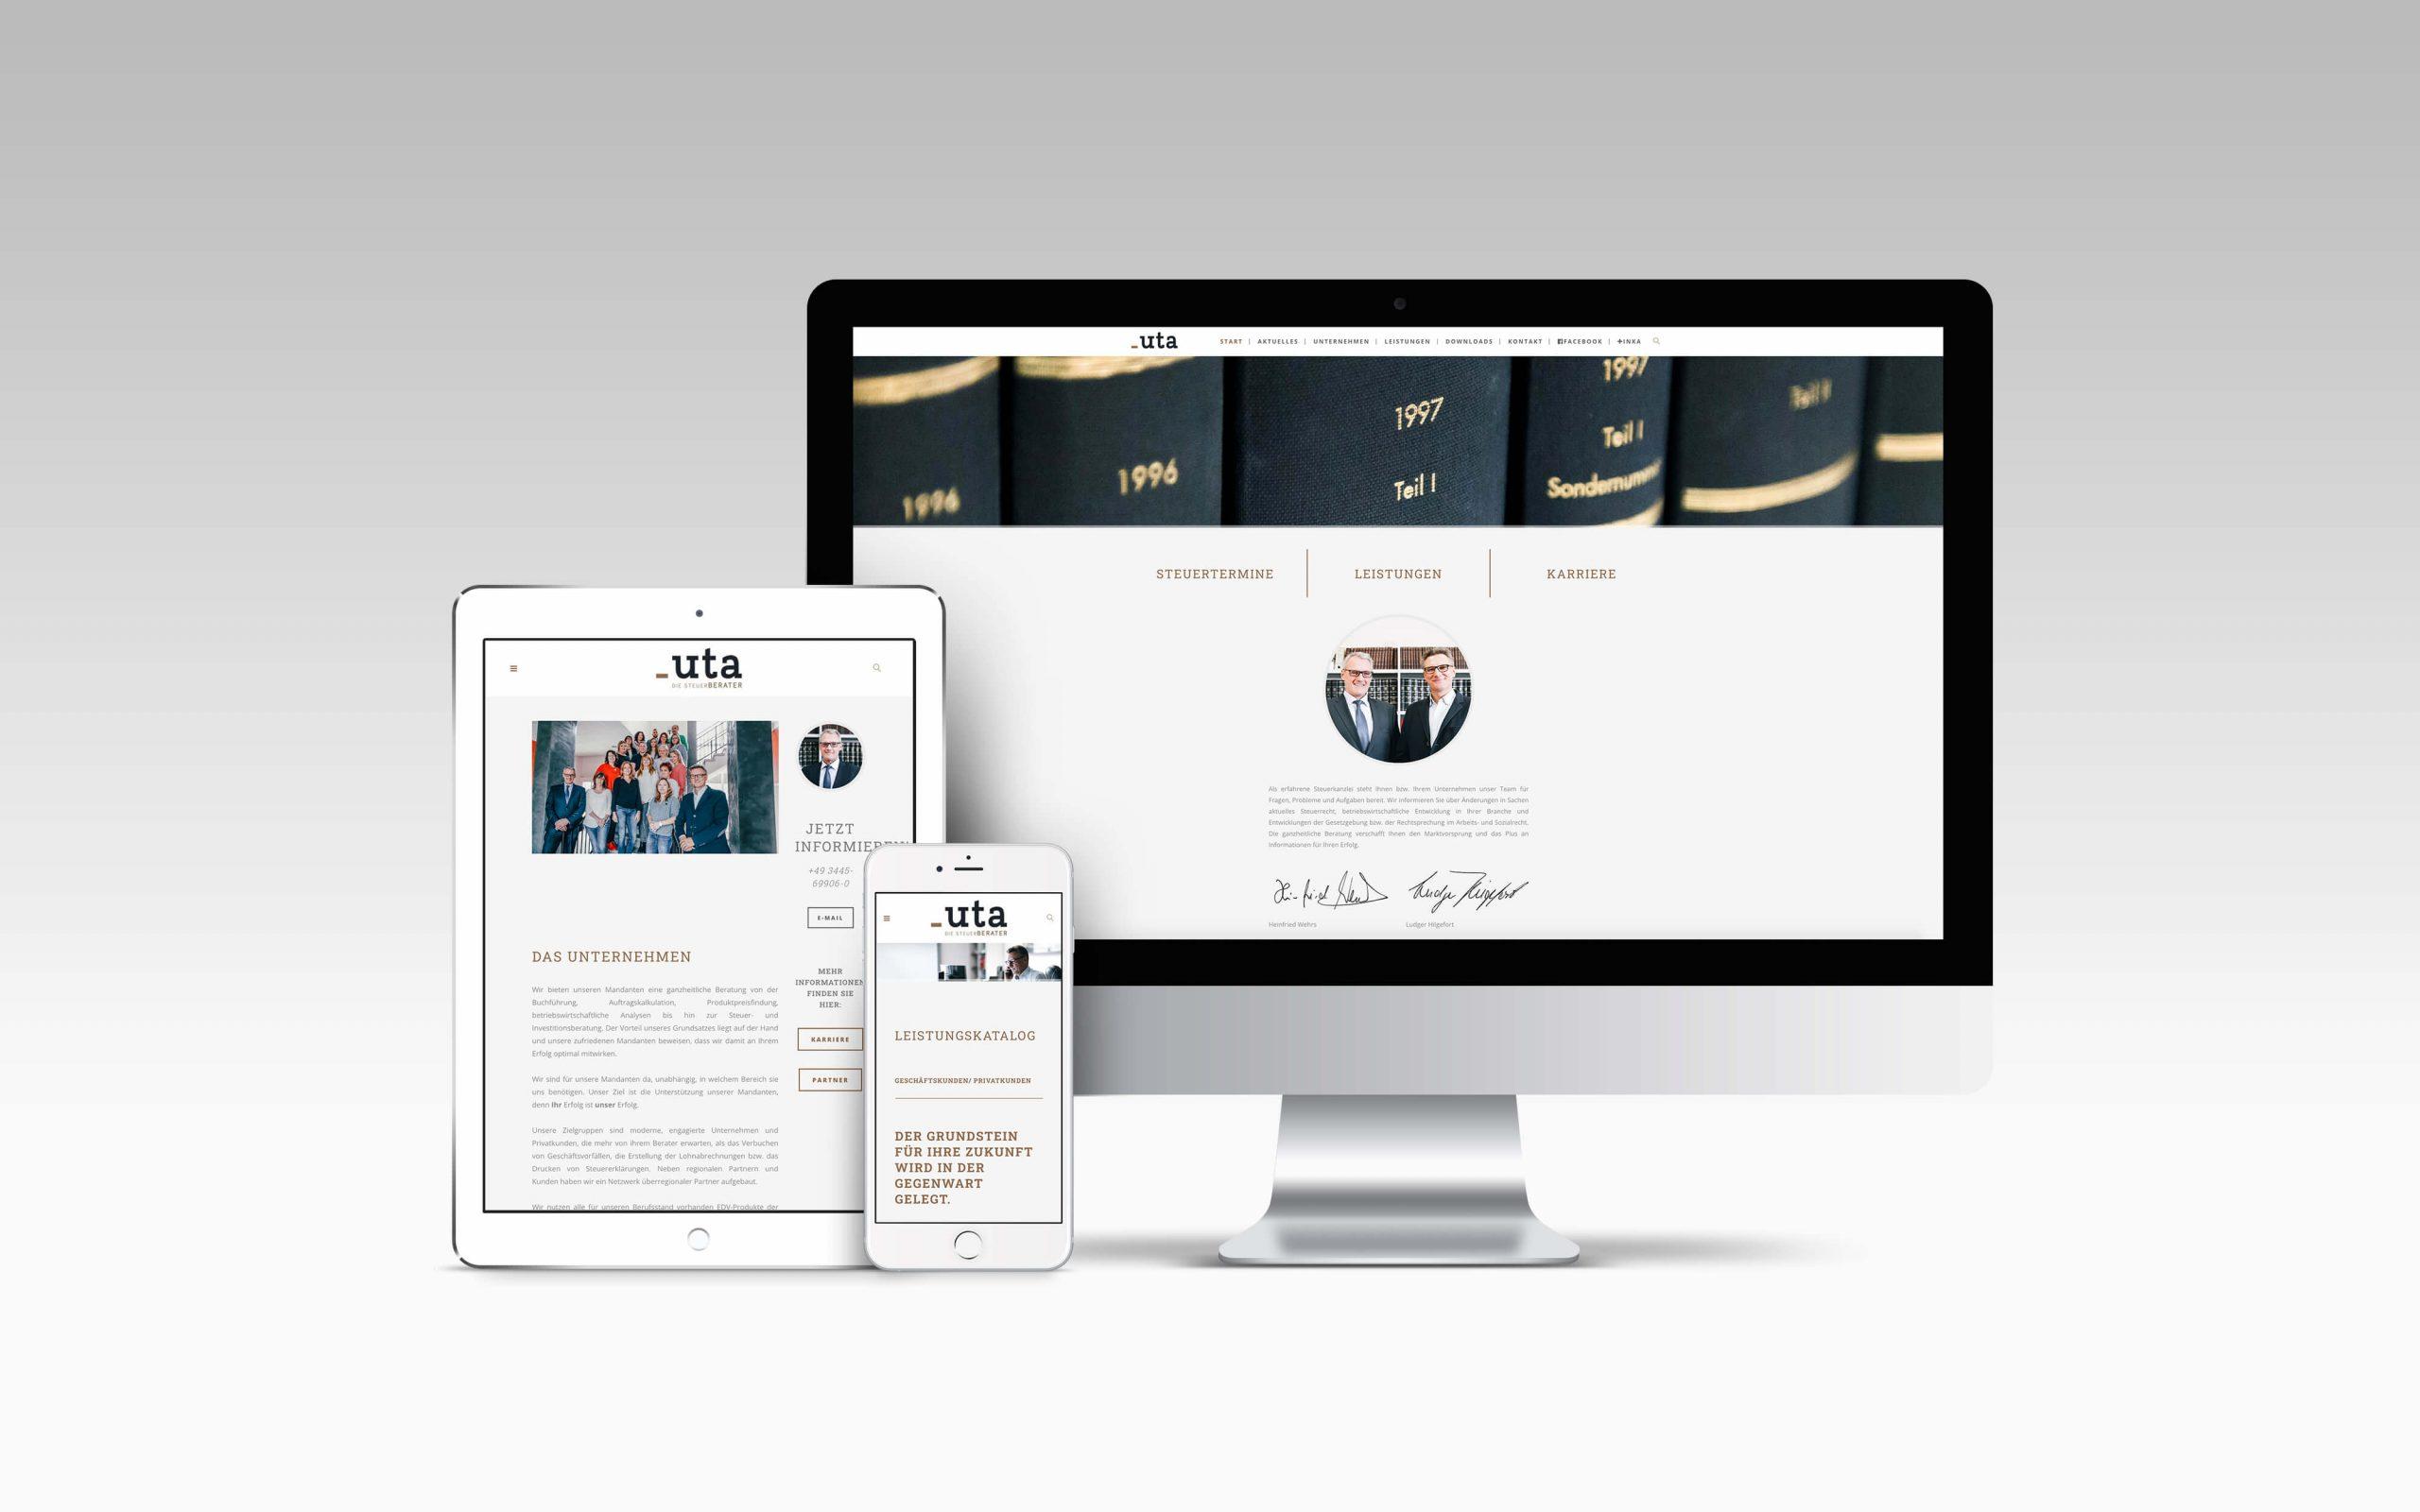 Mockup, UTA - Die Steuerberater, Webdesign für Steuerberater